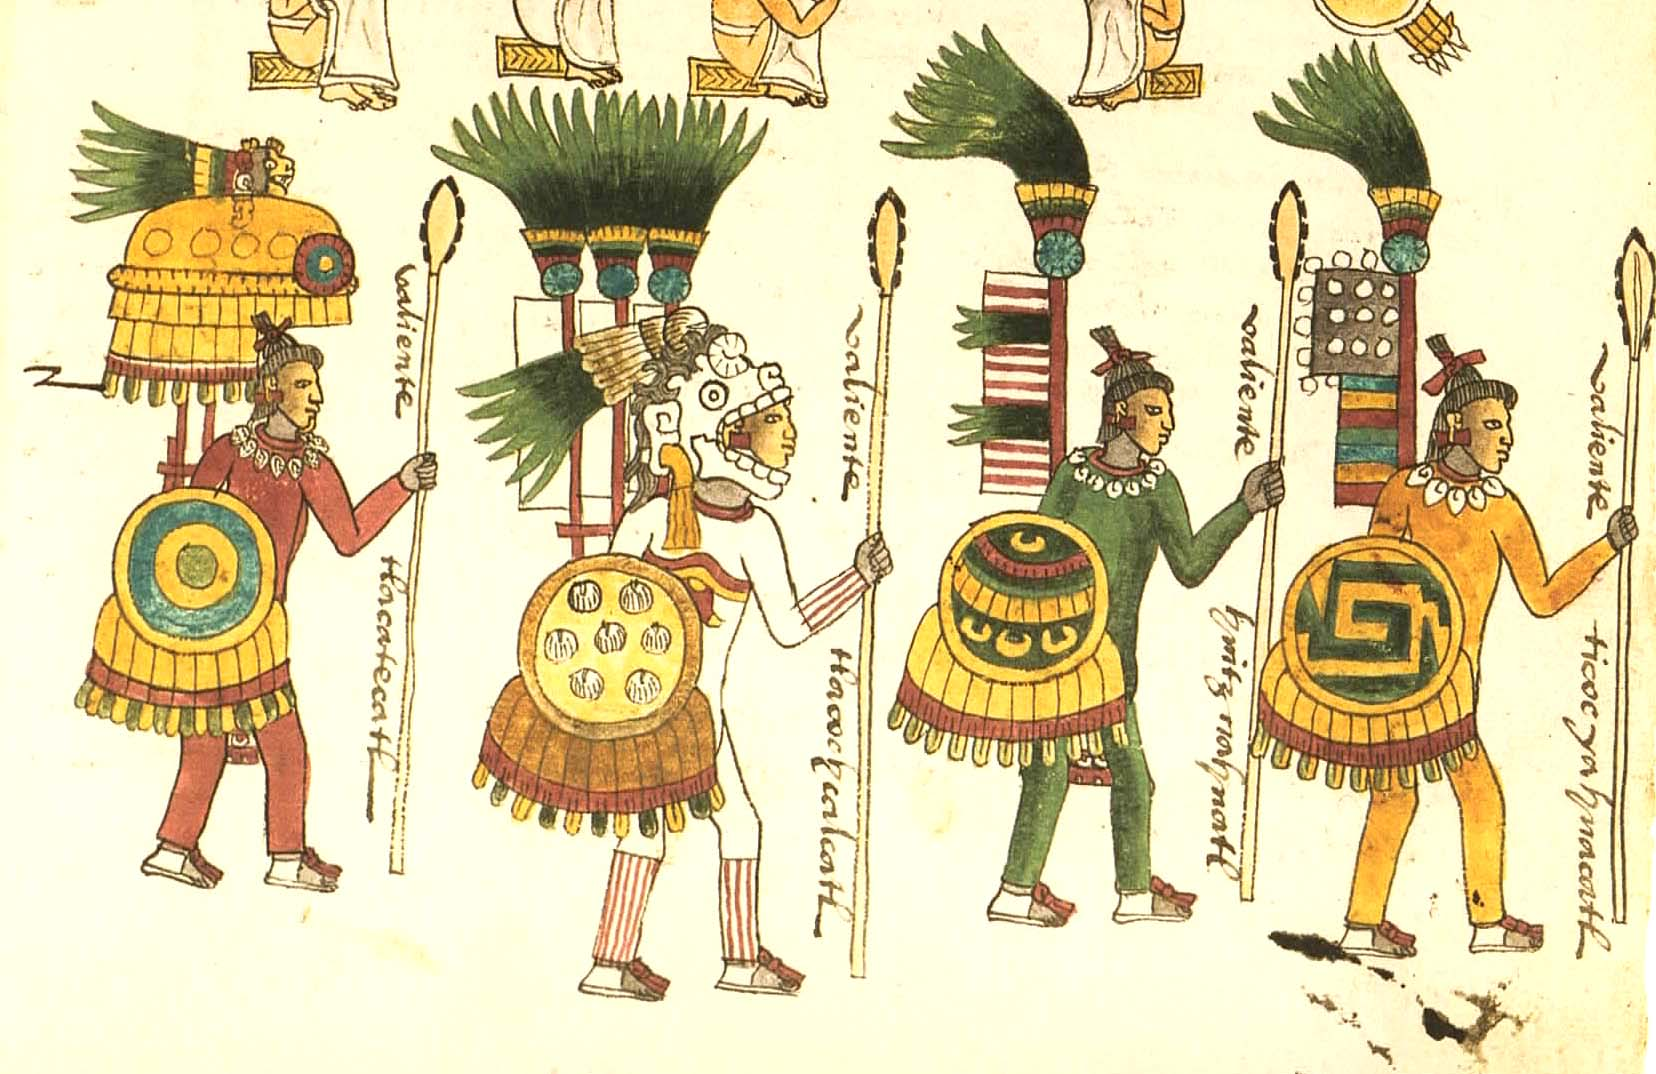 Codex_Mendoza_folio_67r_bottom.jpg